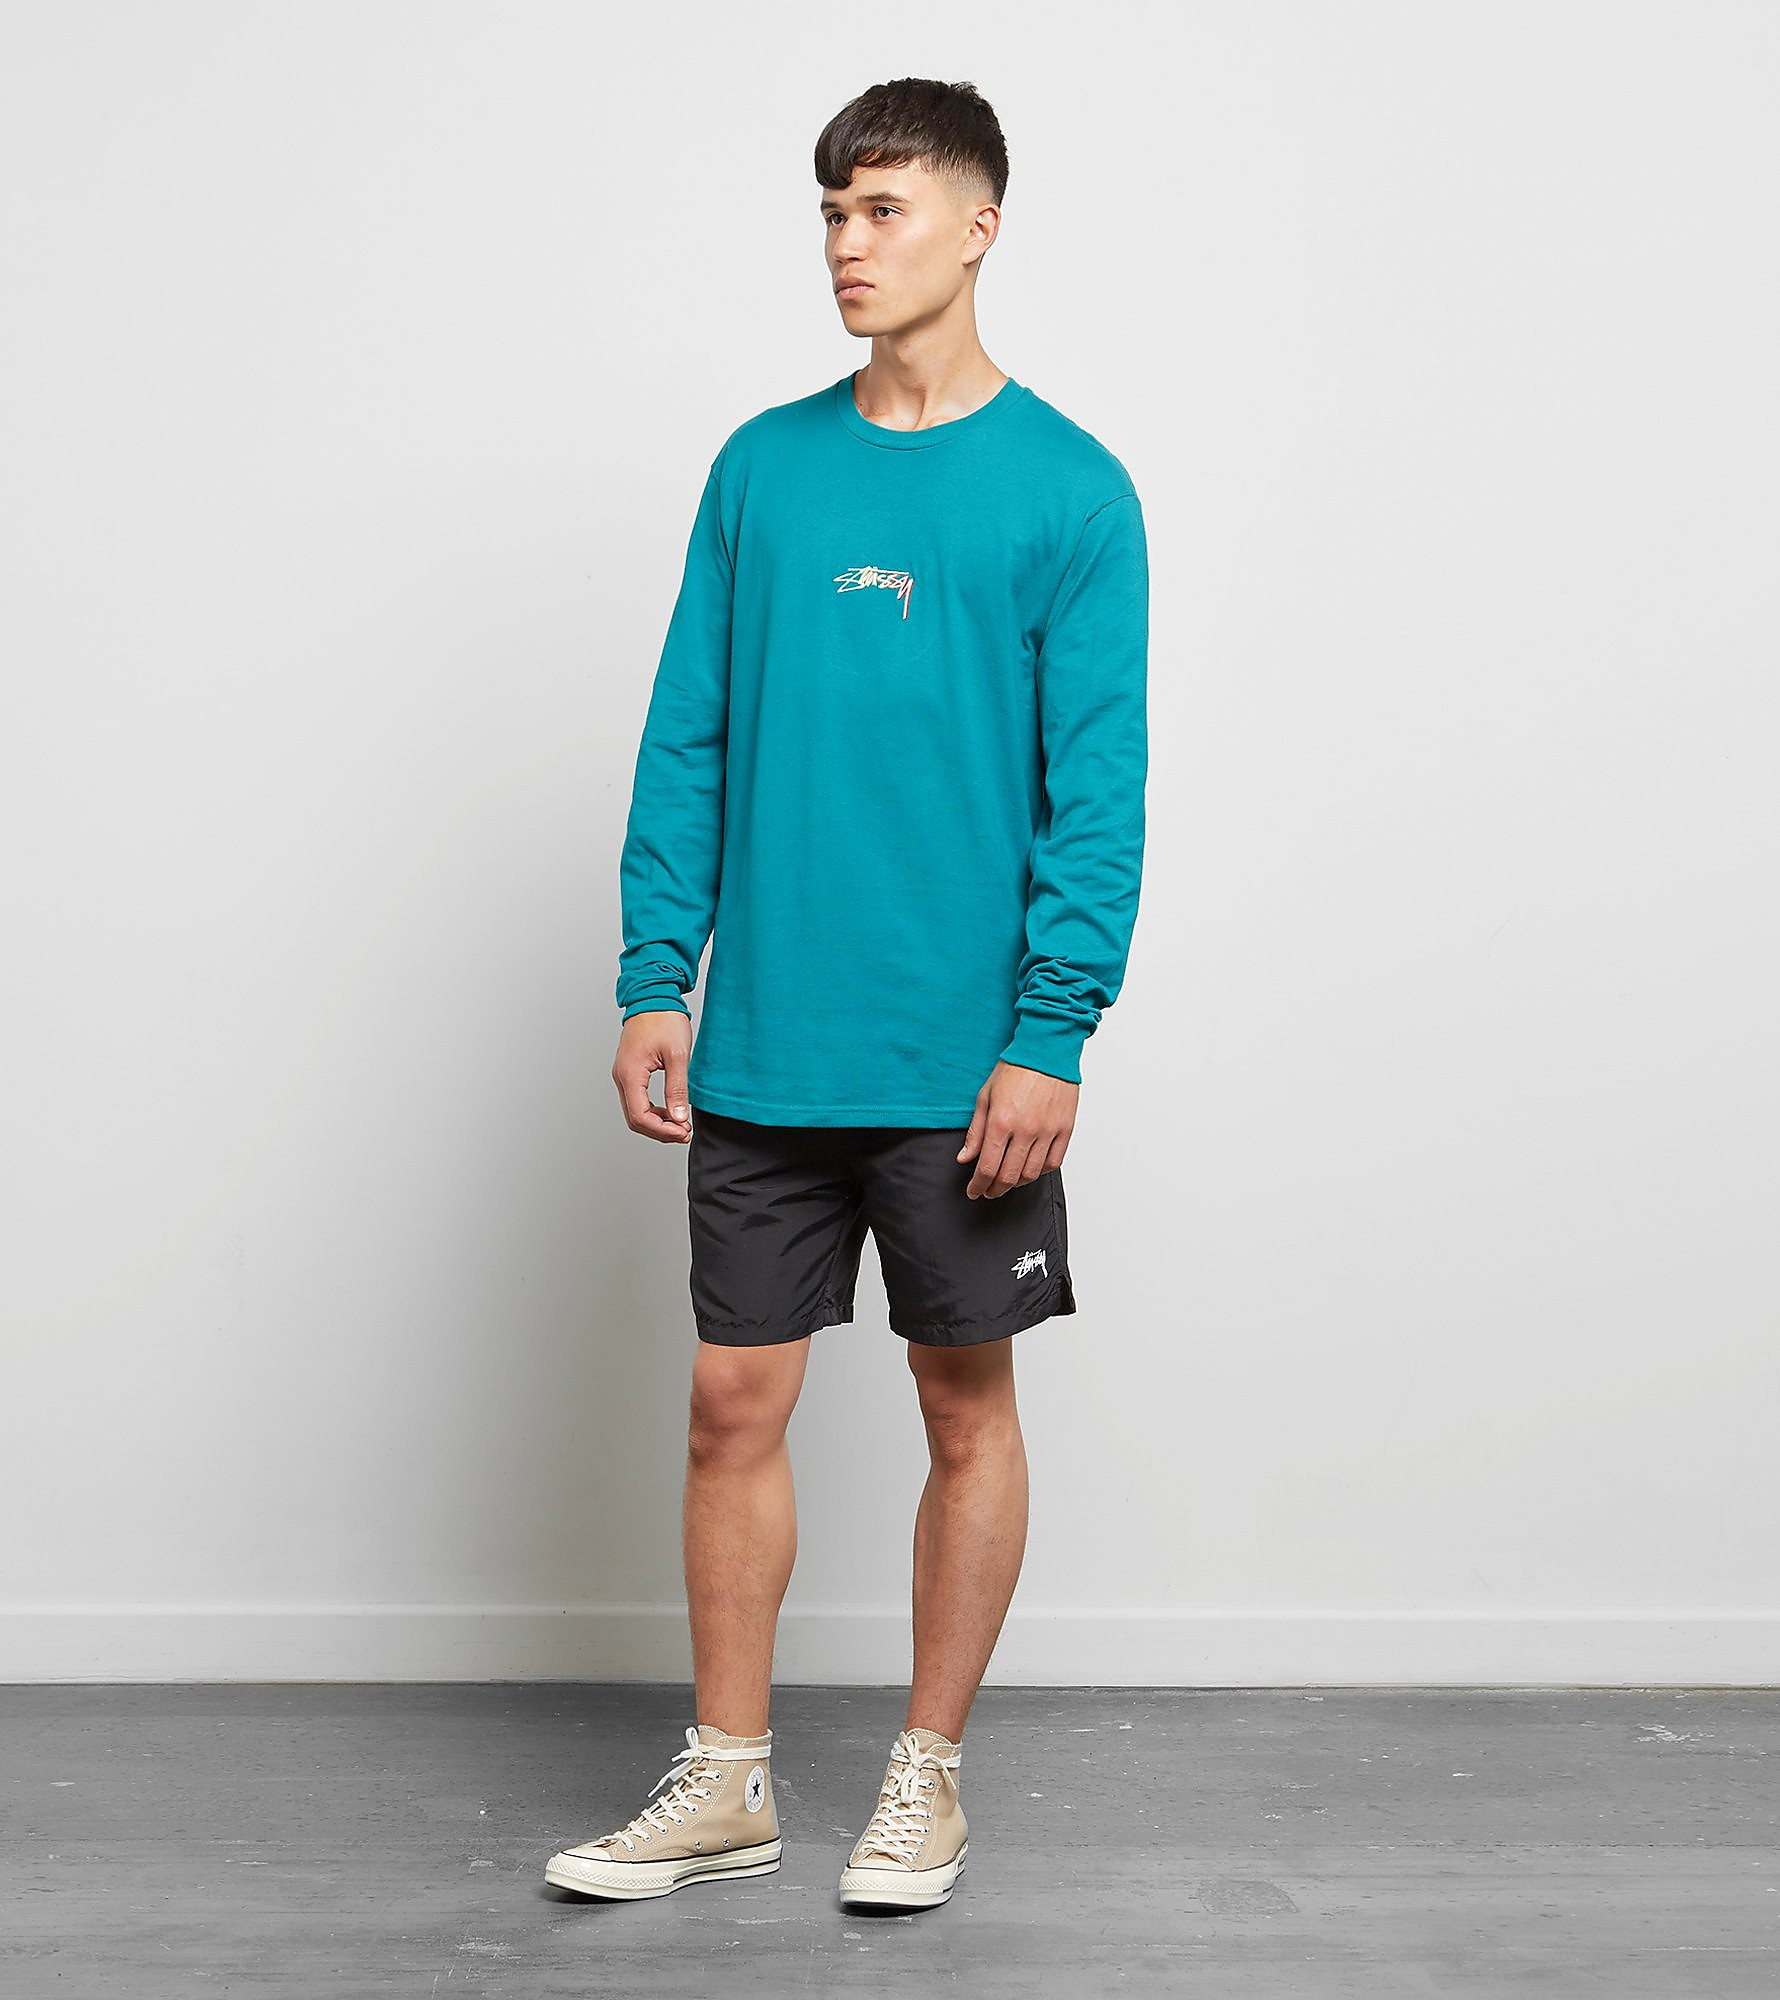 Stussy Long Sleeved Stock T-Shirt